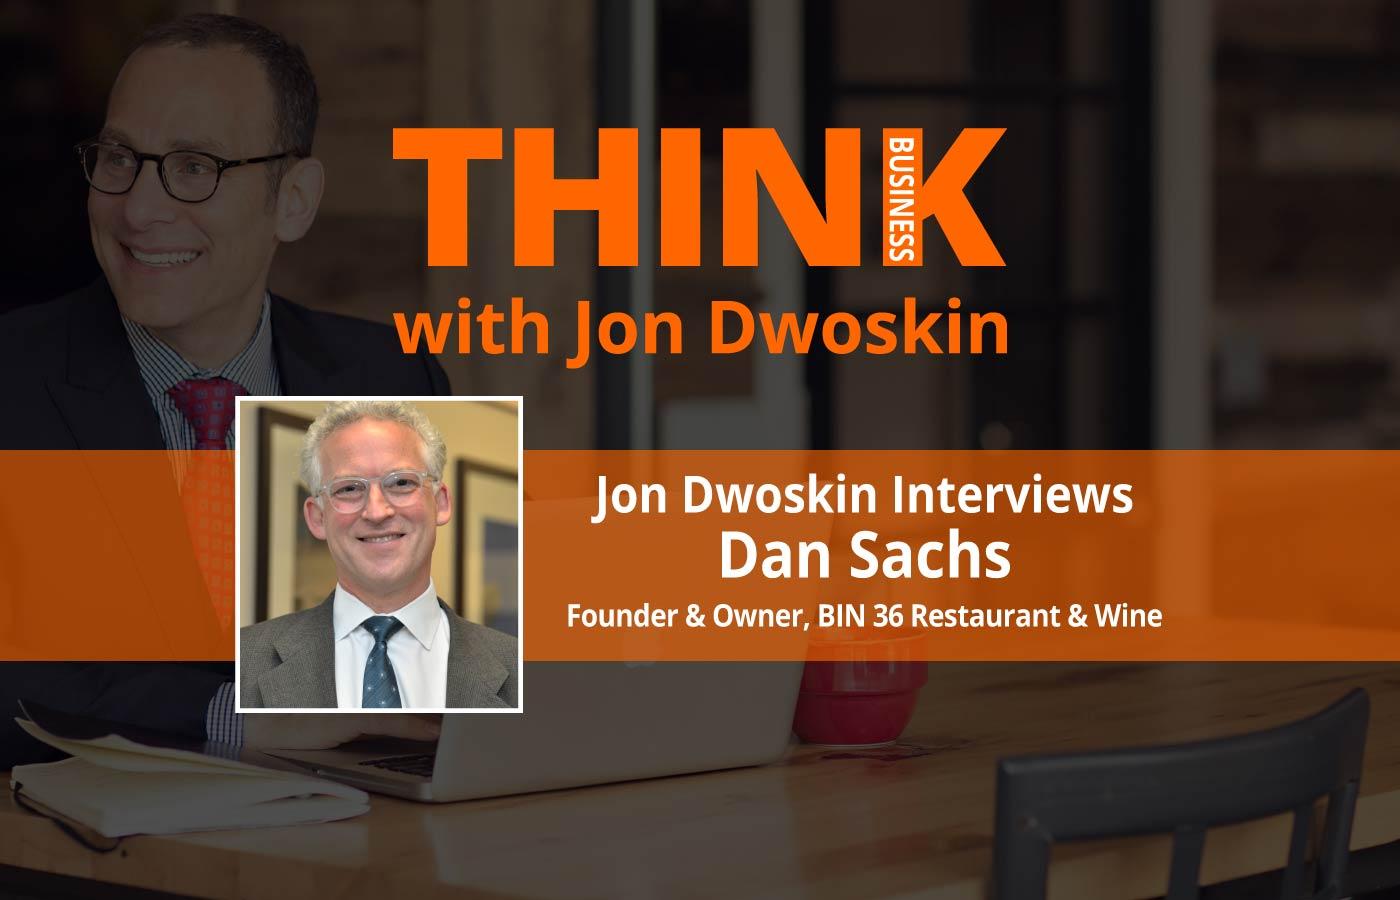 THINK Business Podcast: Jon Dwoskin Interviews Dan Sachs